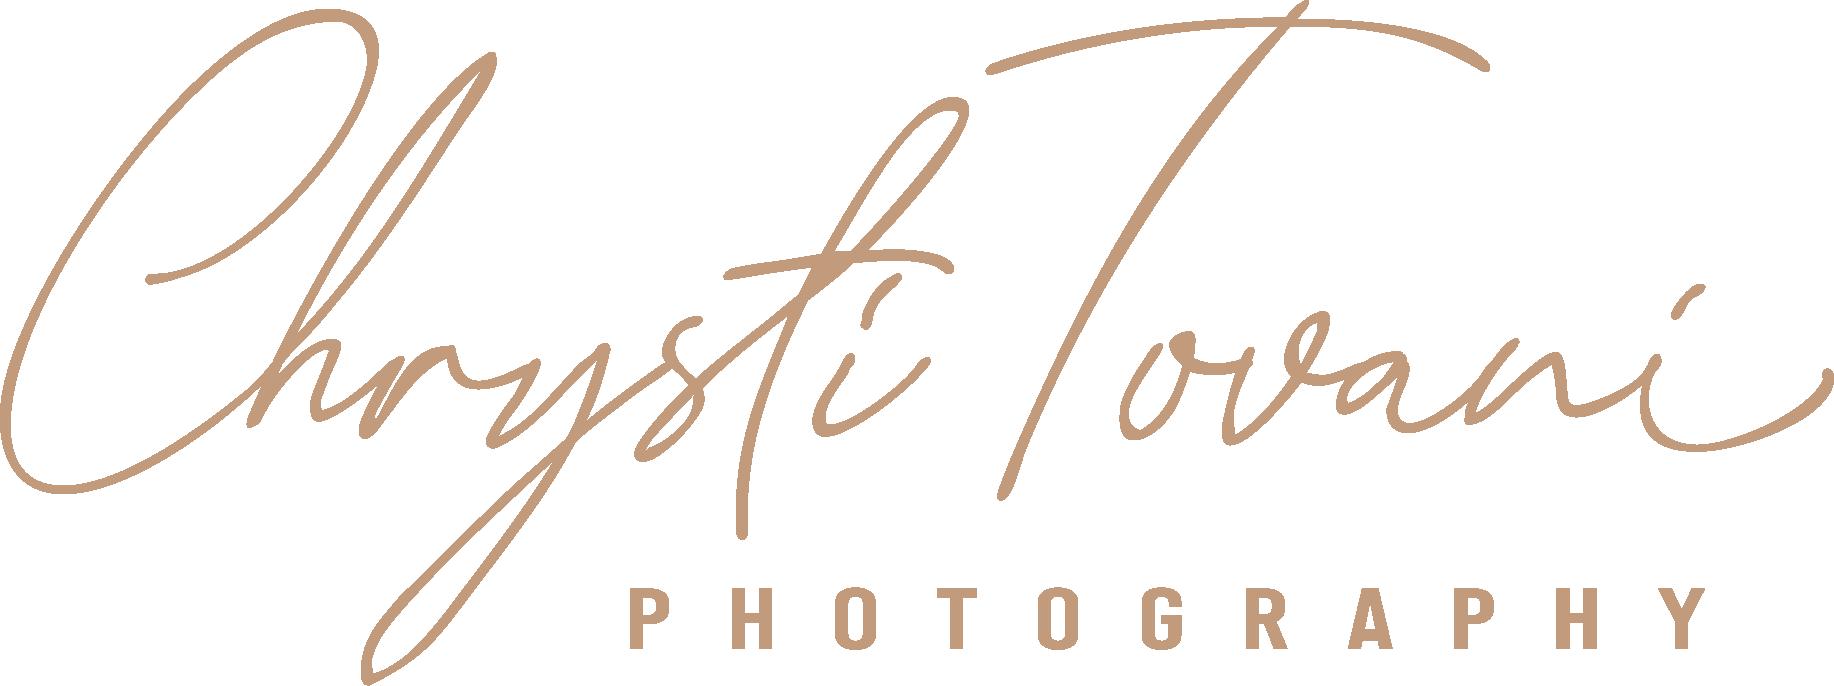 CHRYSTI TOVANI PHOTOGRAPHY bf9a7a